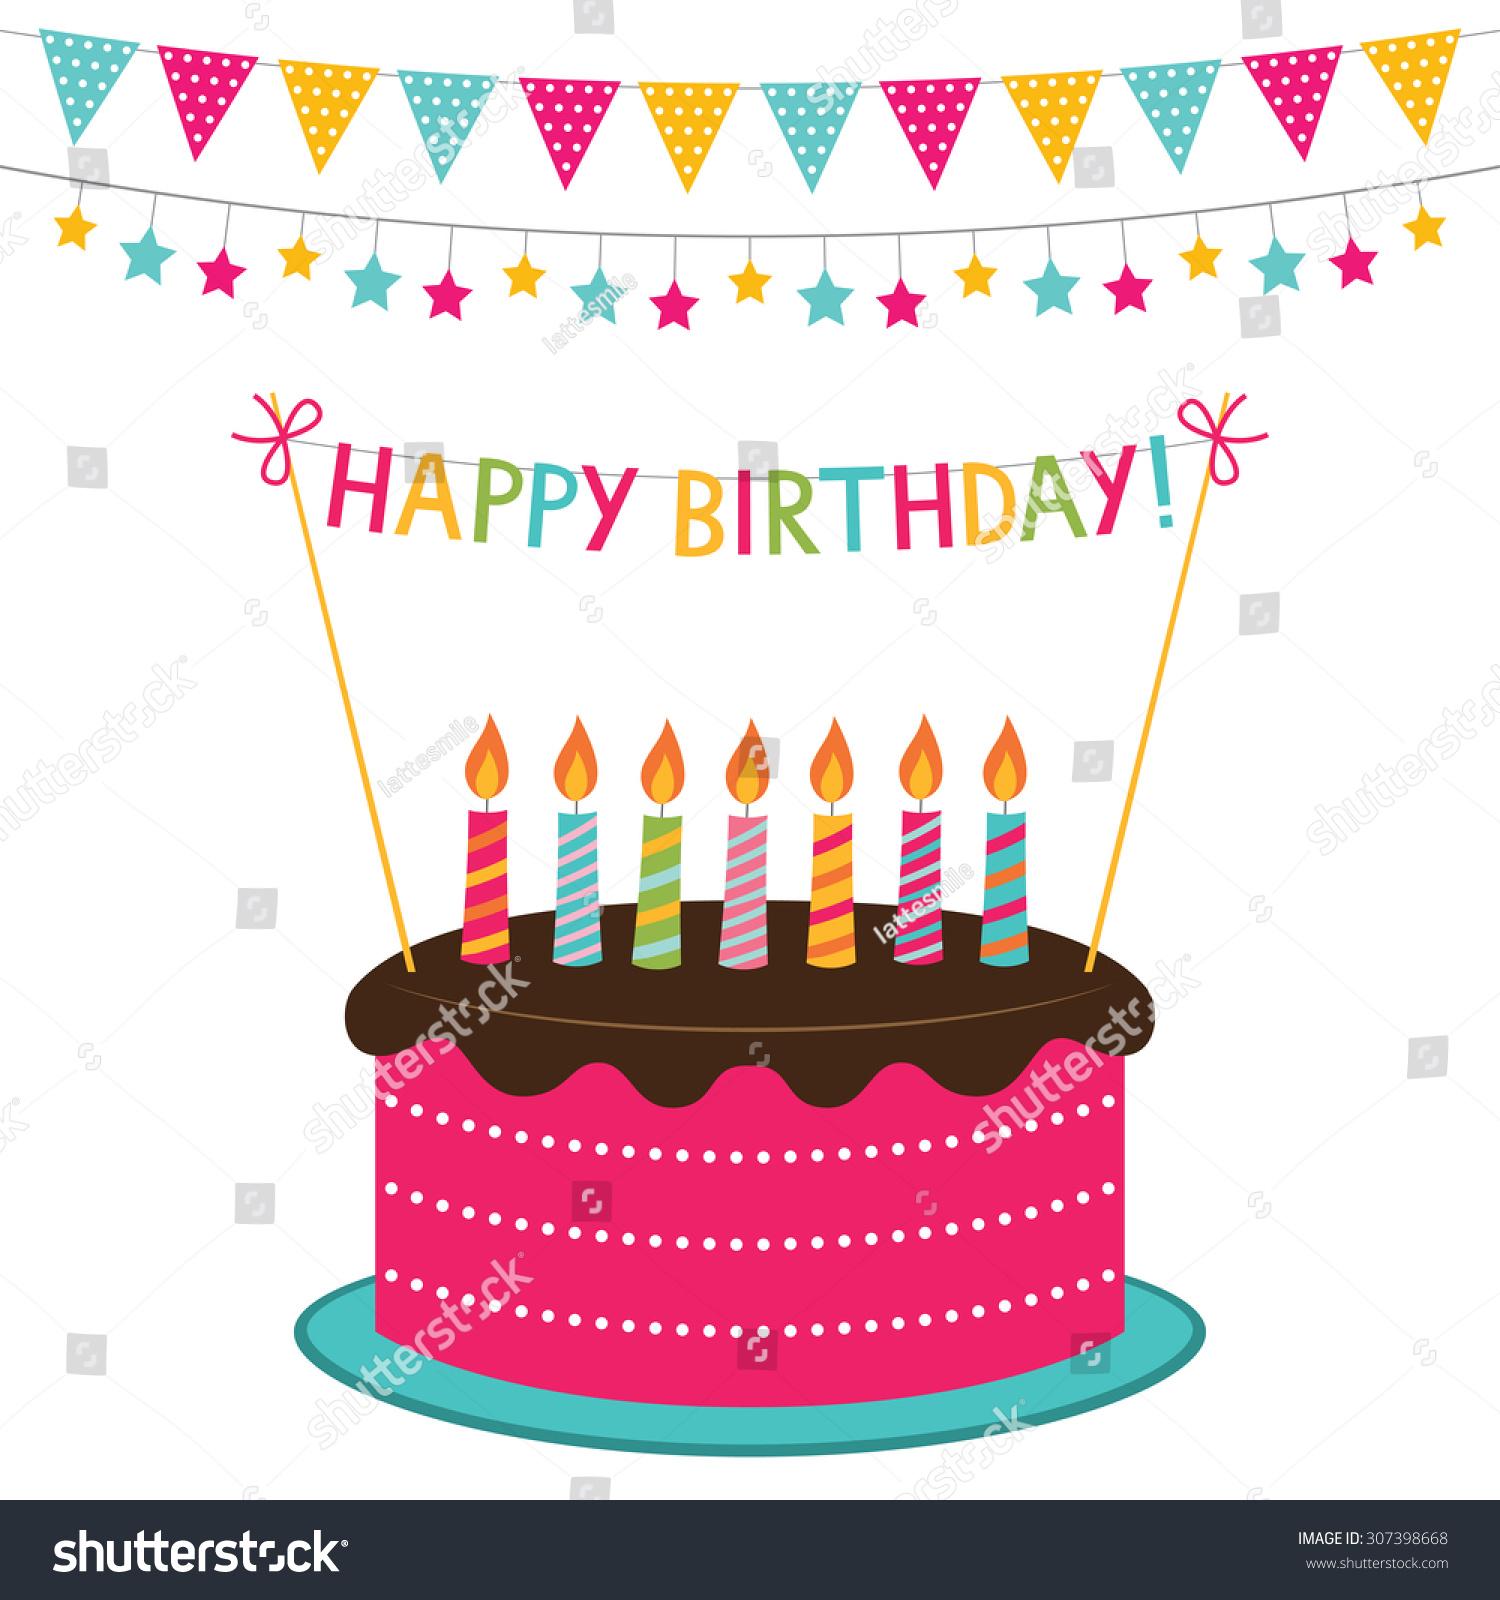 Vector Birthday Card Cake Decoration Stock Vector 307398668